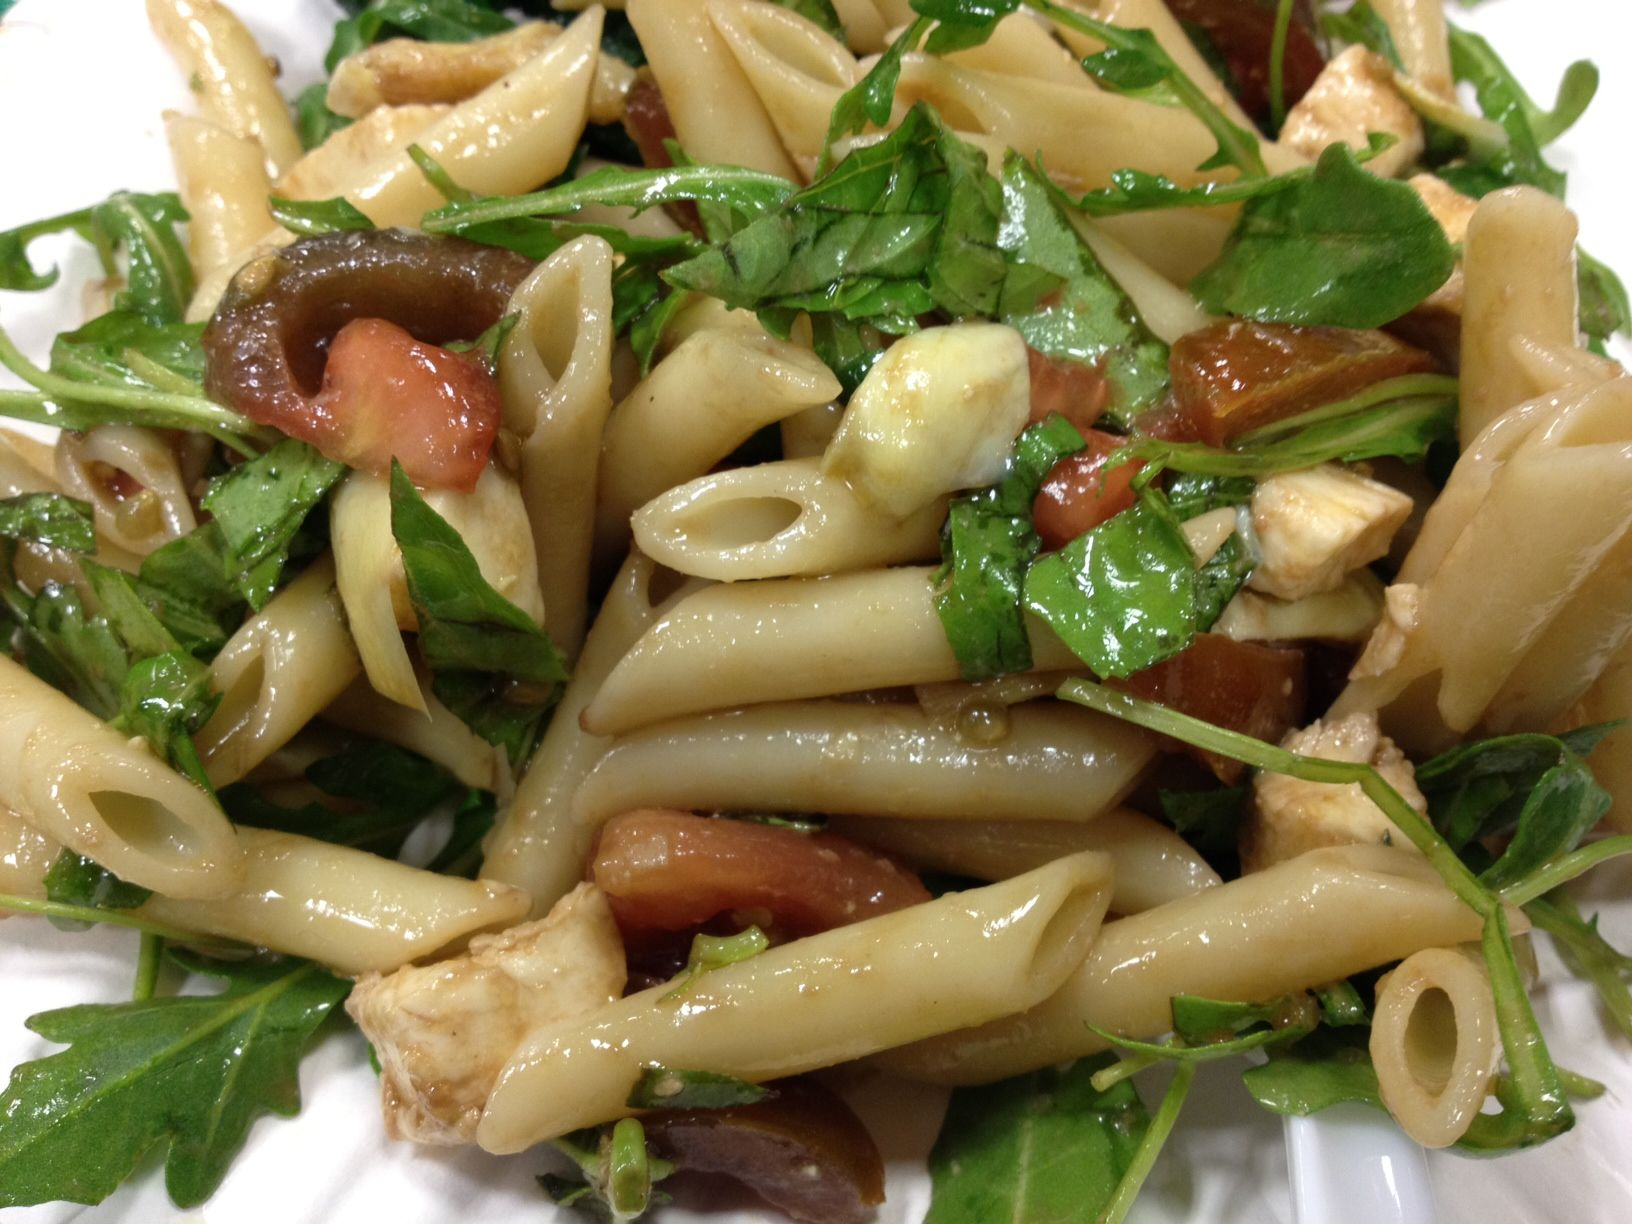 Vegetarian Italian Pasta Salad with Arugula